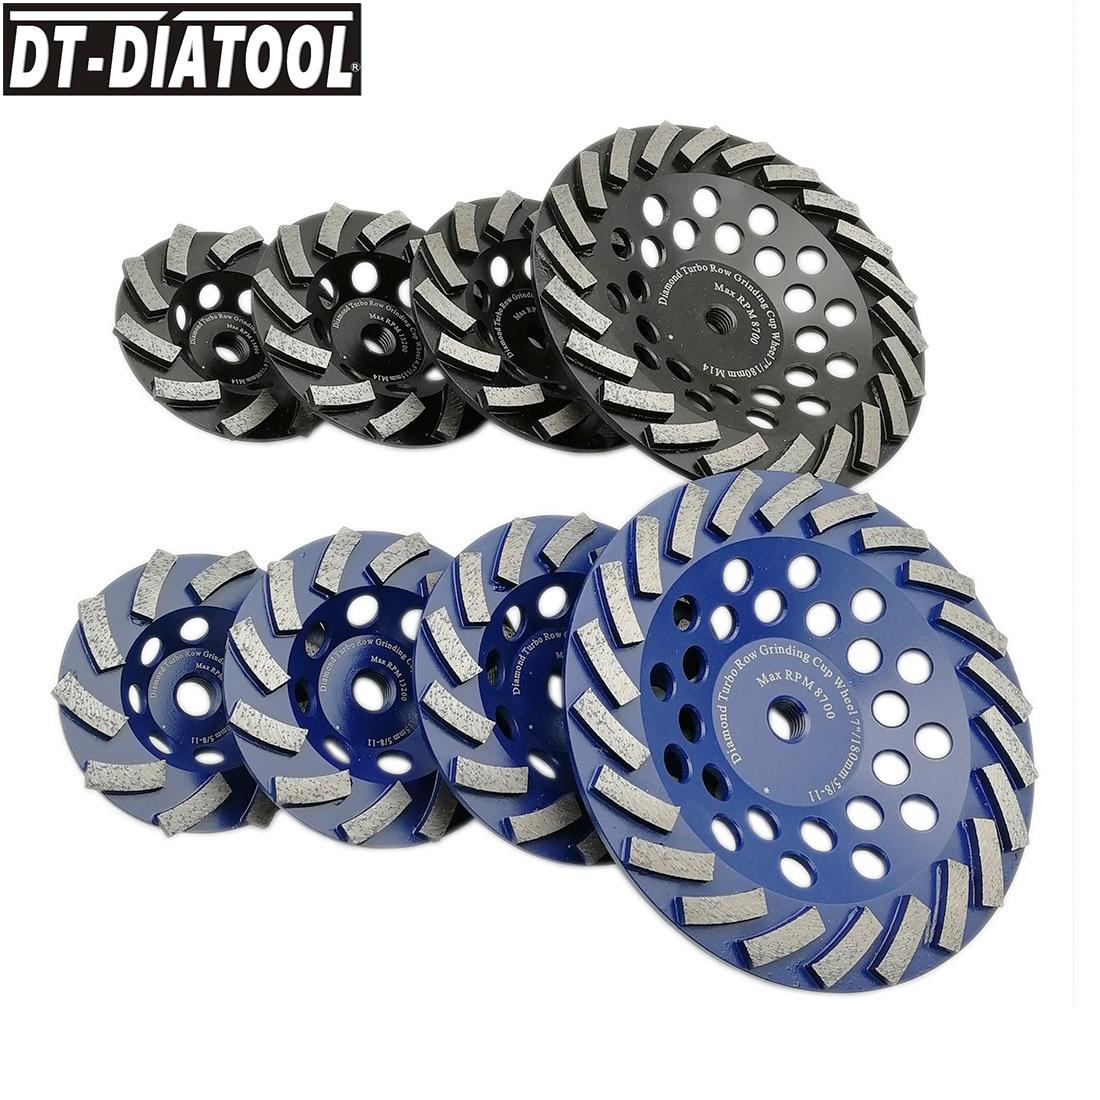 "DT-DIATOOL 1pc Dia 4""/4.5""/5""/7"" Segmented Diamond Concrete Turbo Cup Grinding Wheel with M14 or 5/8-11 thread Sanding Wheel"